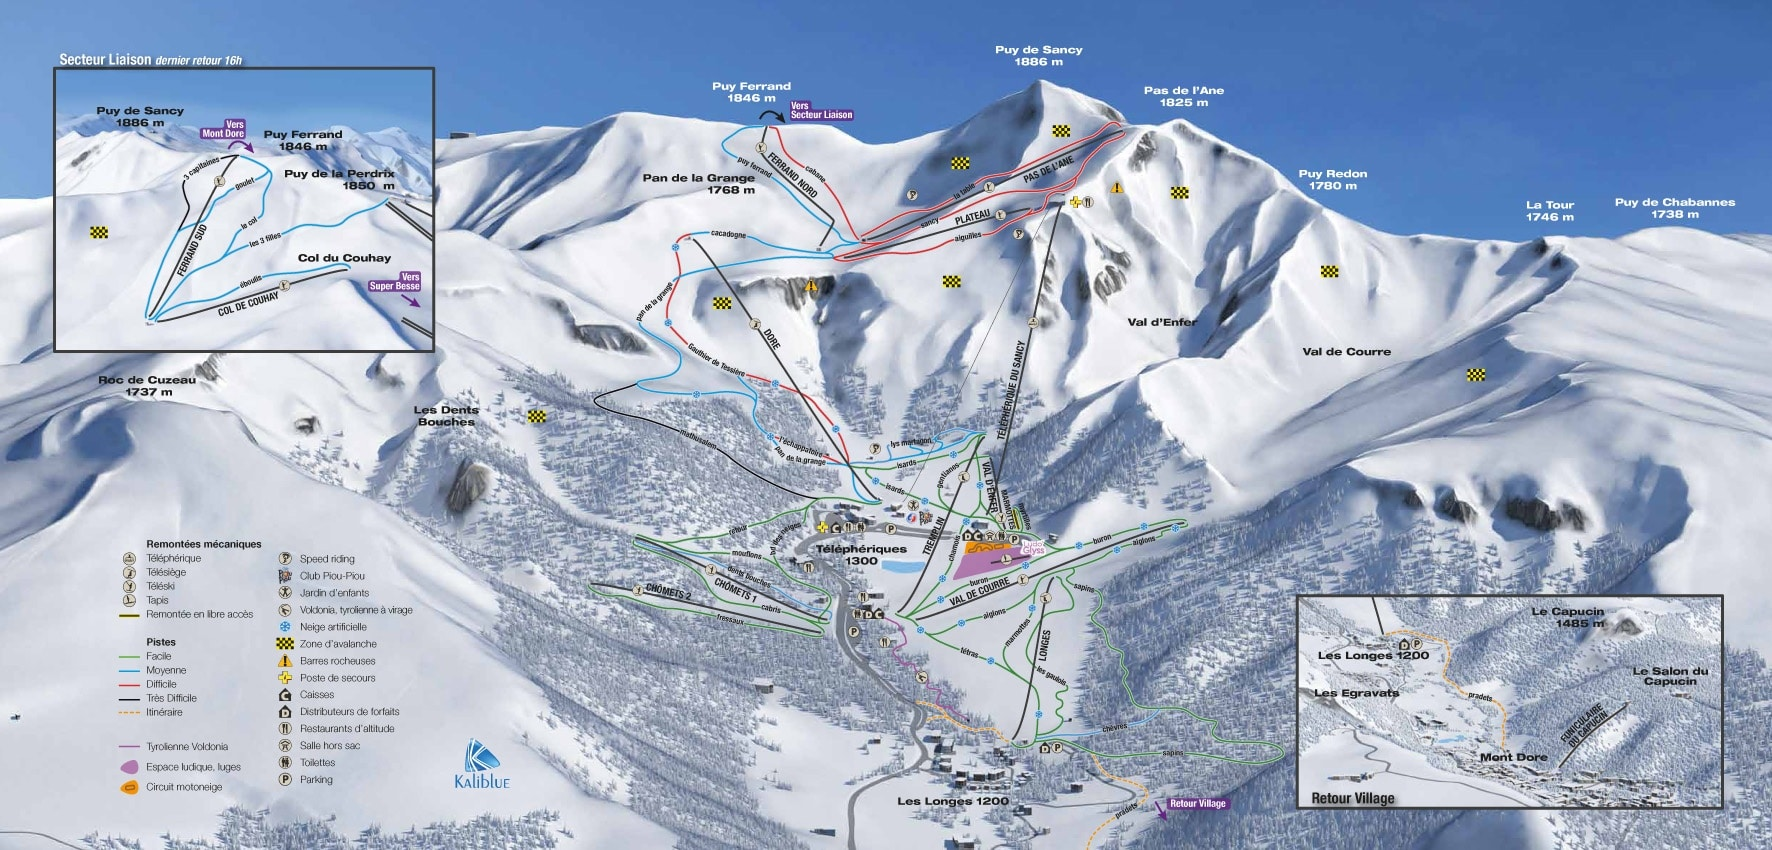 Plan des pistes ski alpin mont-dore